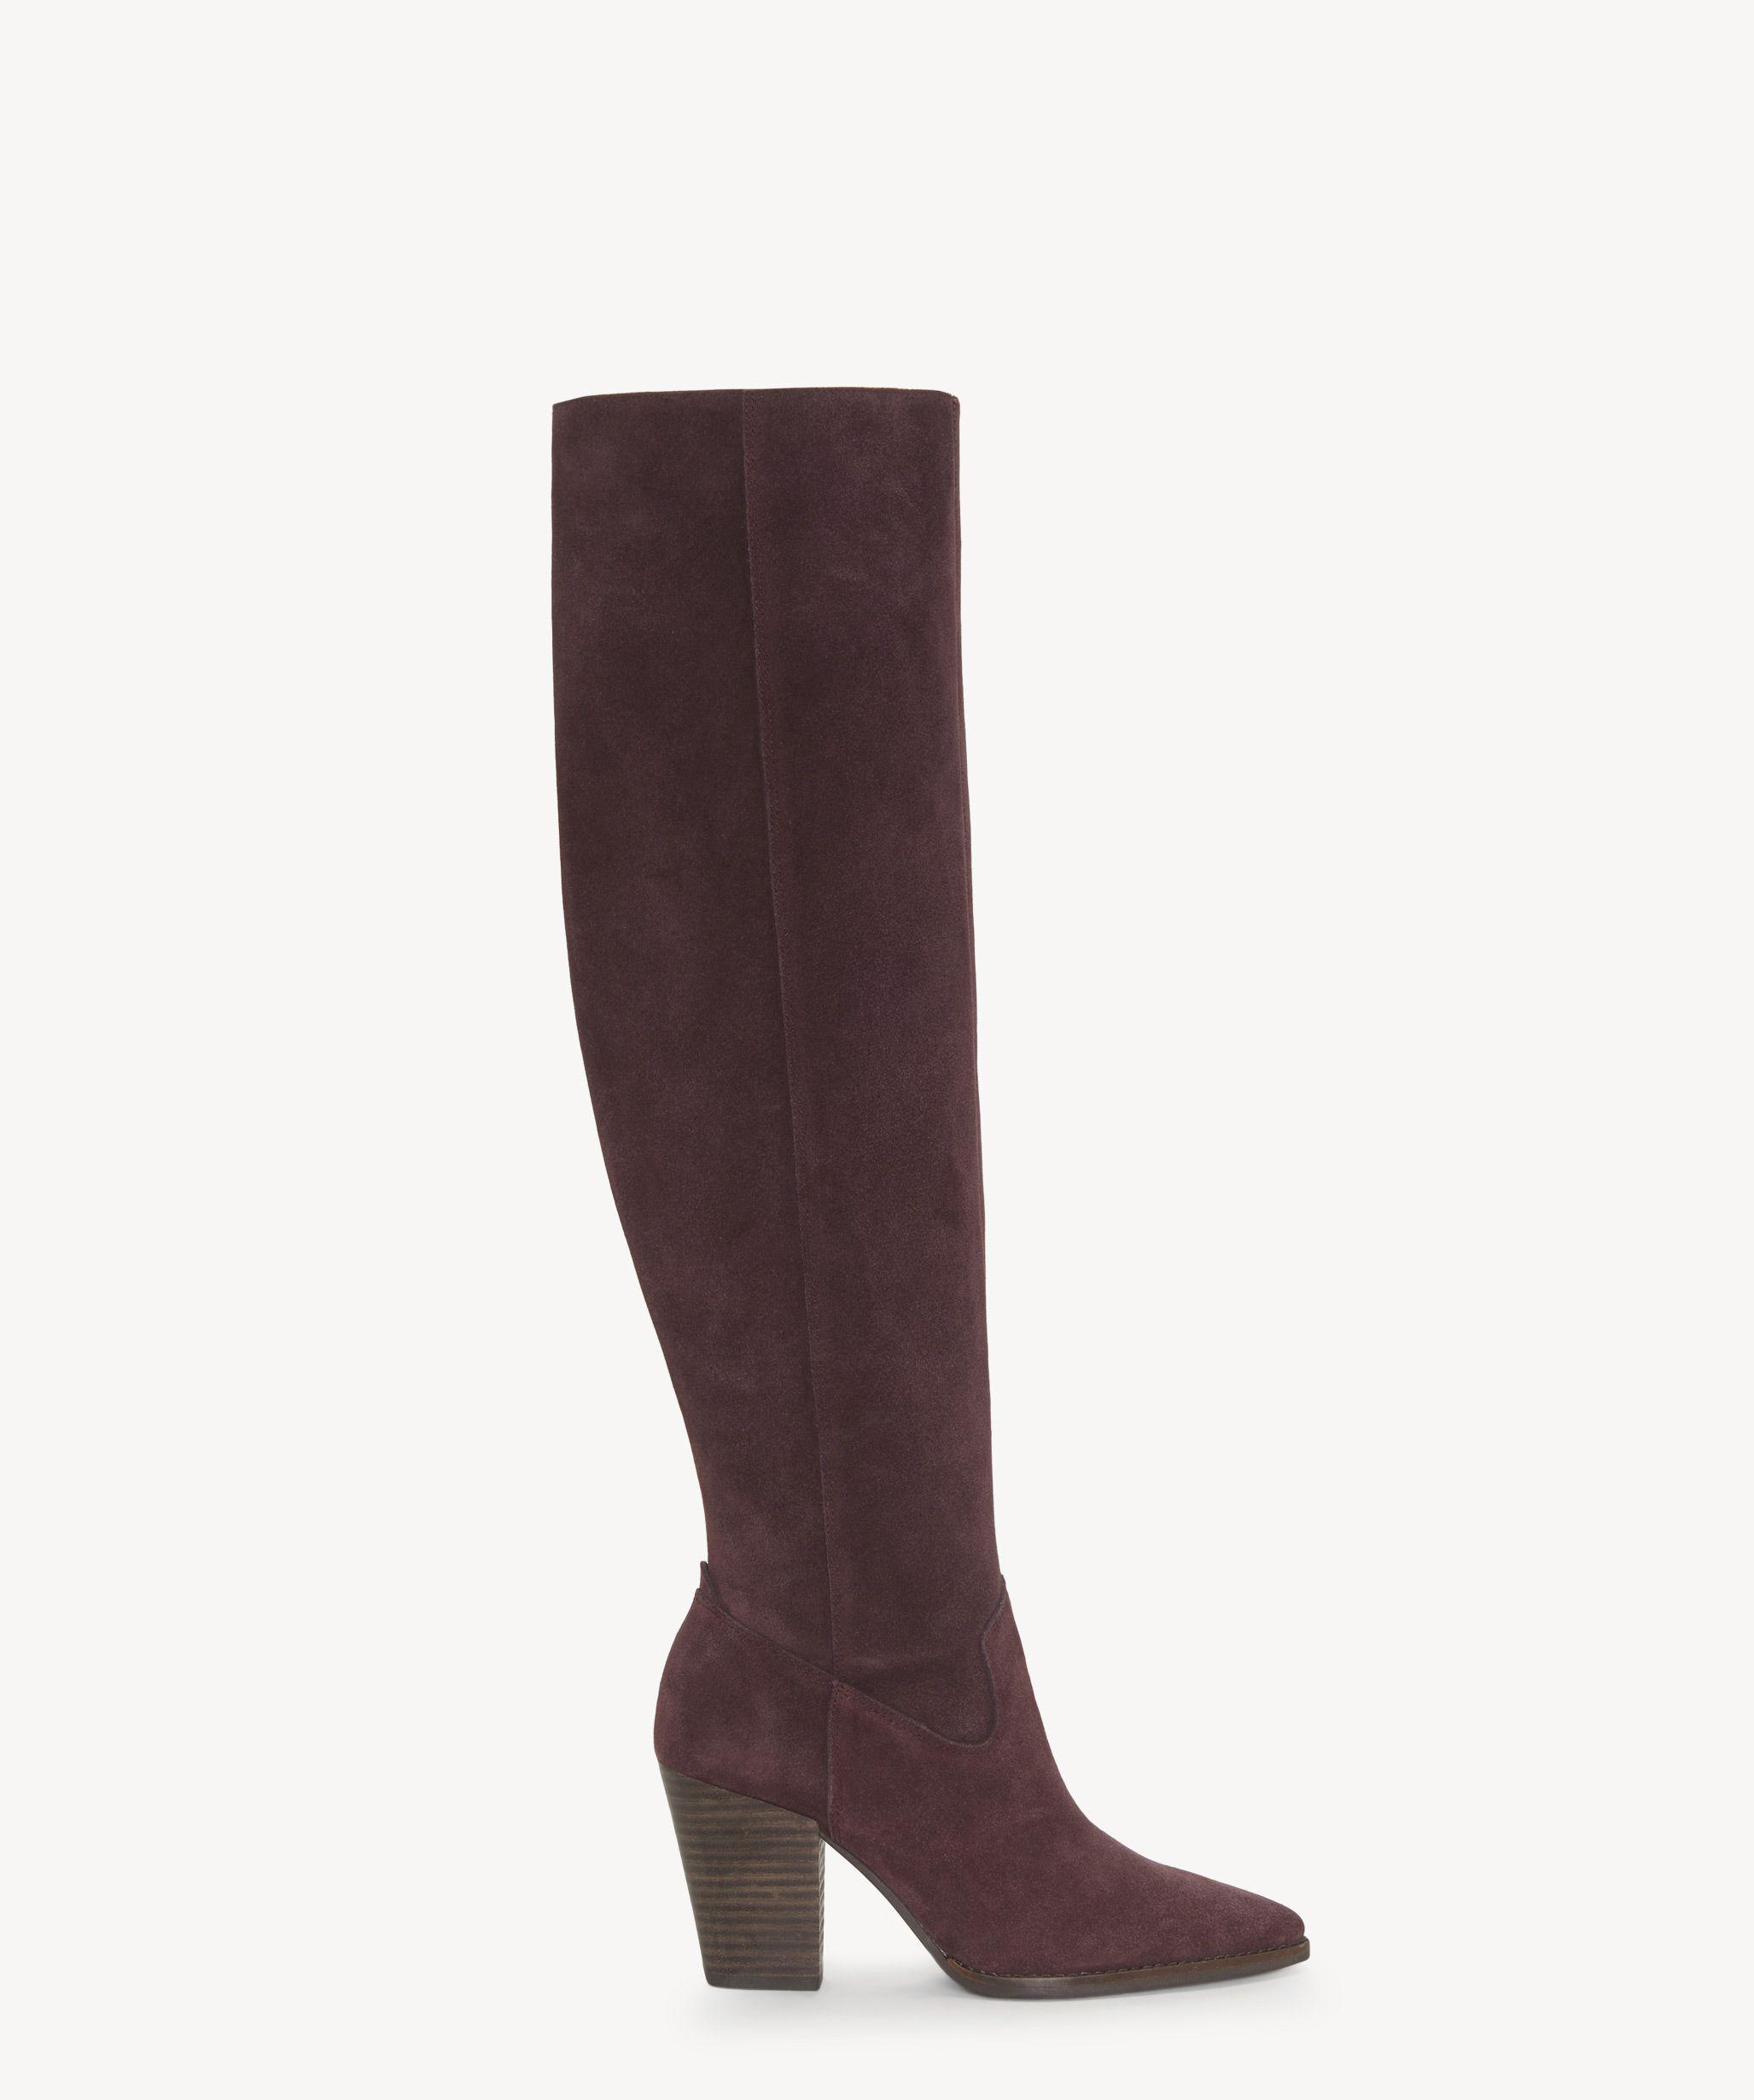 84db0f4a874 Lyst - Lucky Brand Azoola Tall Boot